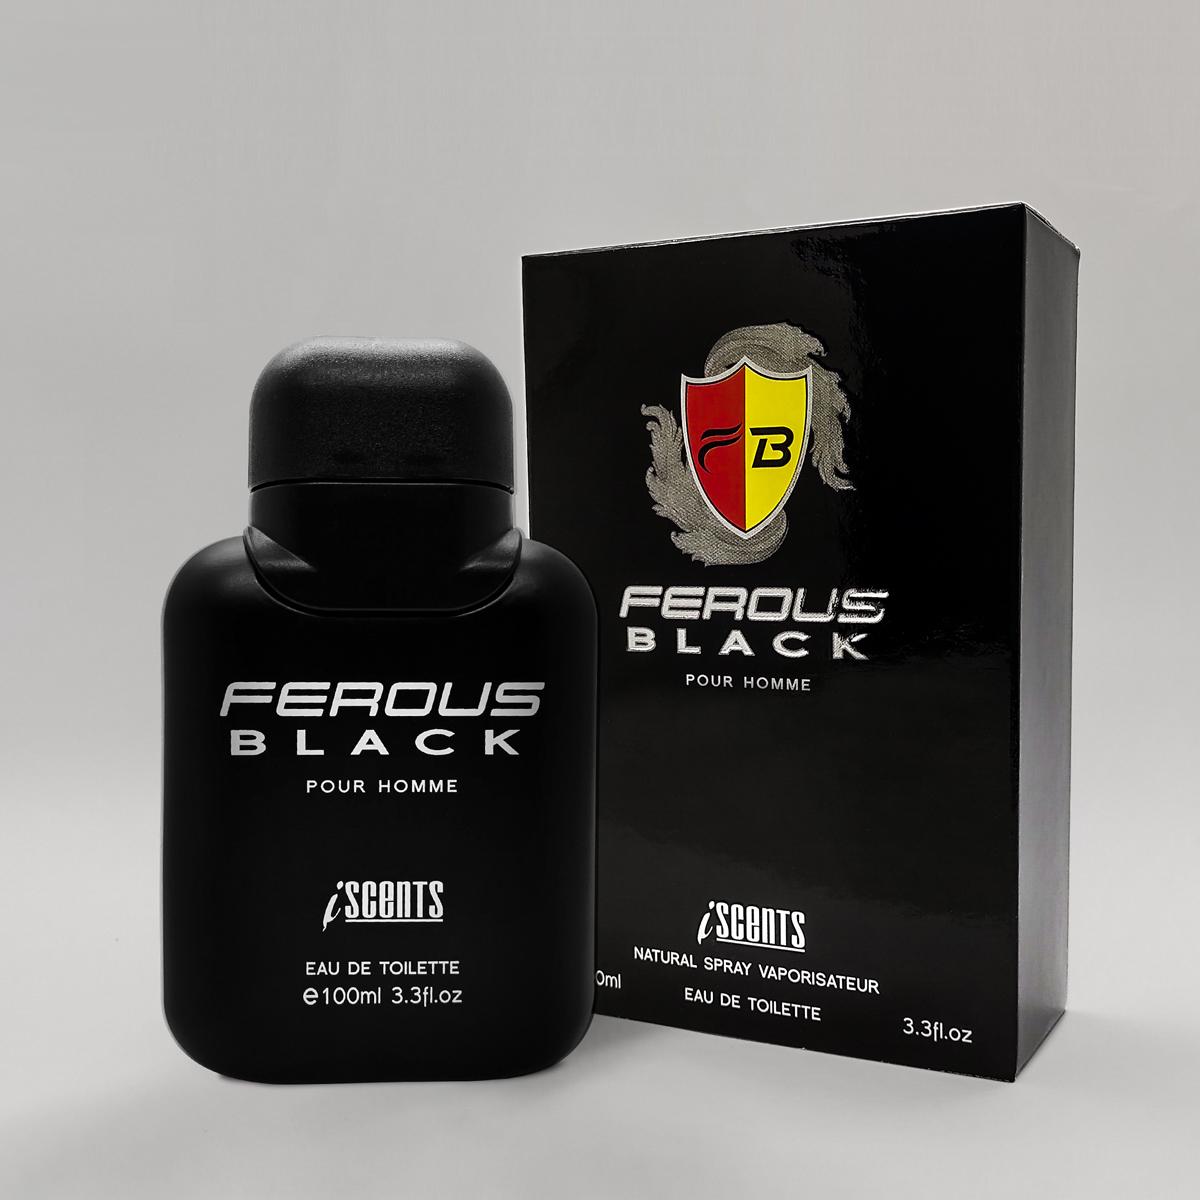 Perfume Ferous Black masculino edt 100 ml I Scents